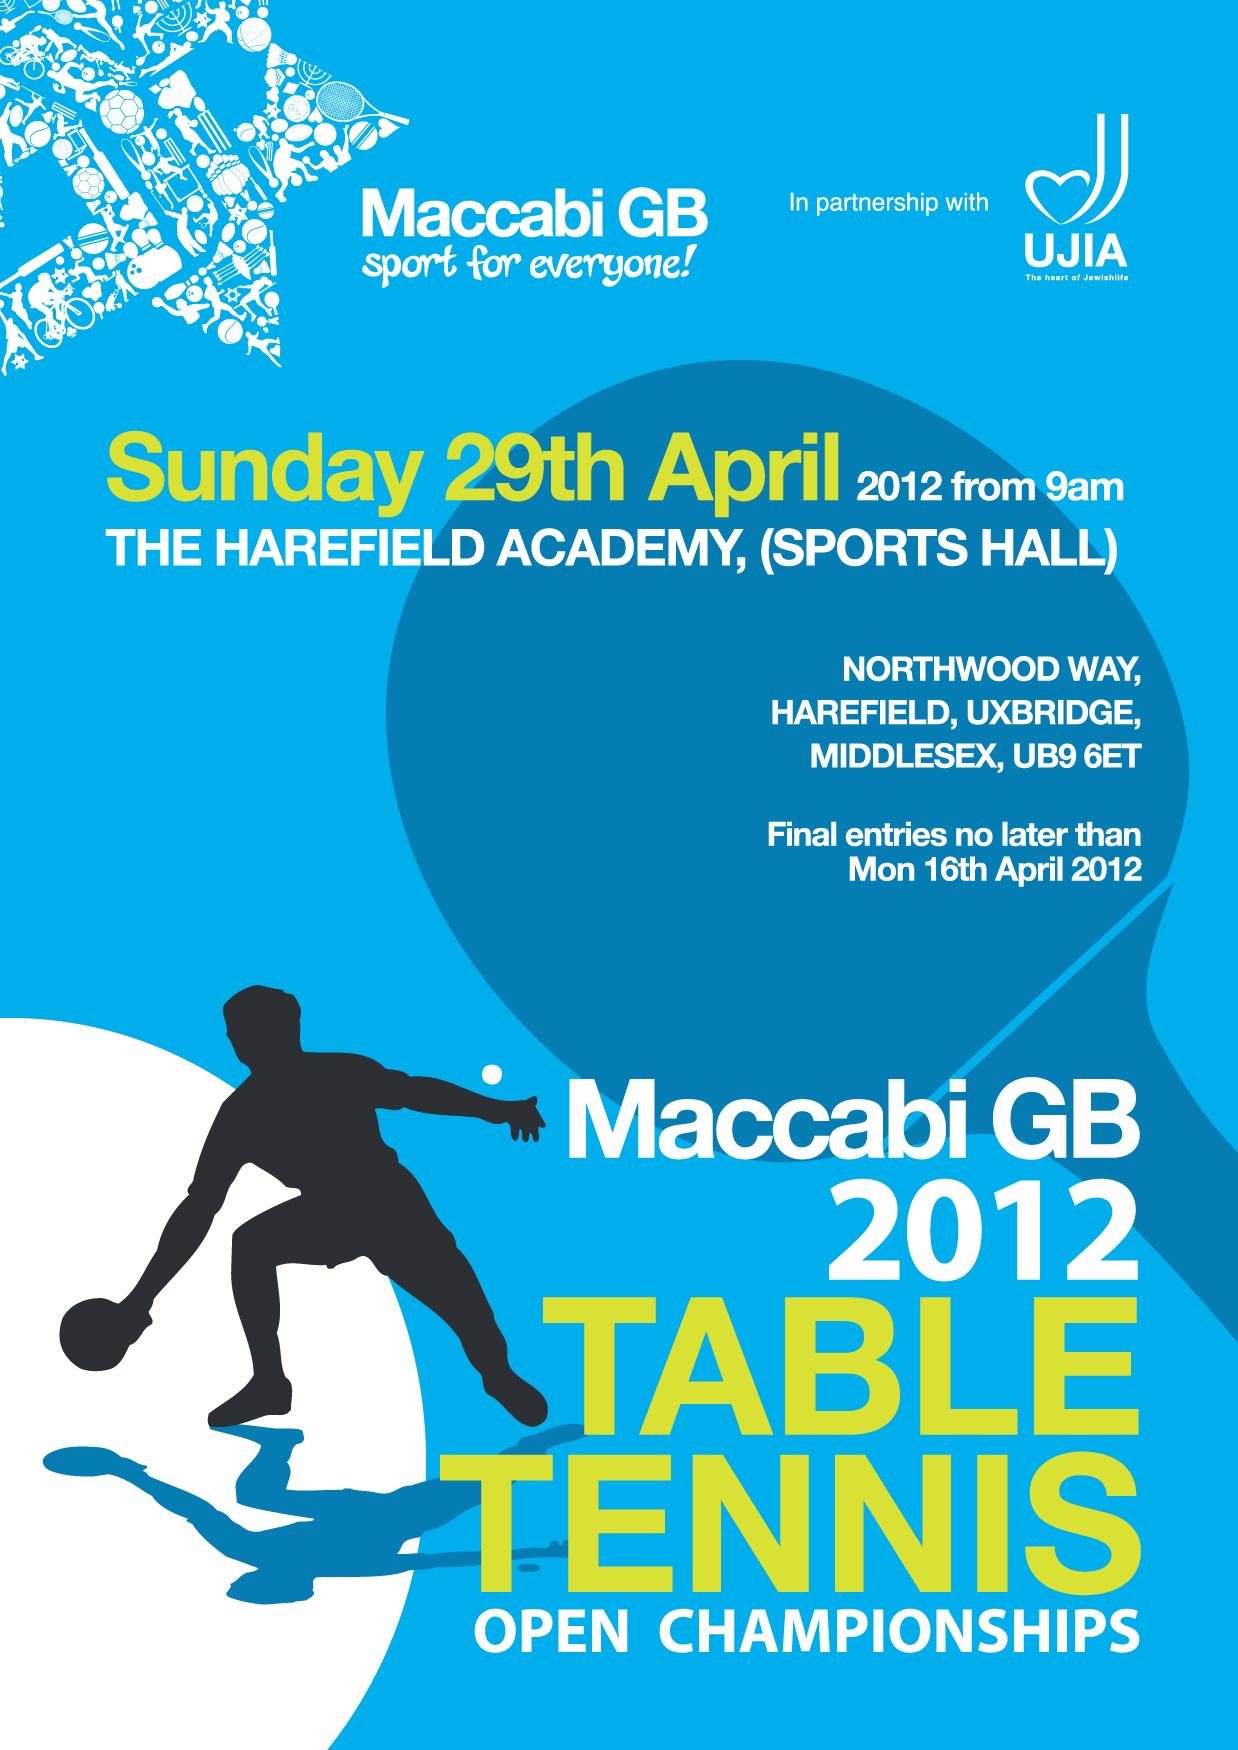 table tennis tournament template - maccabi gb table tennis open championships 2012 maccabi gb